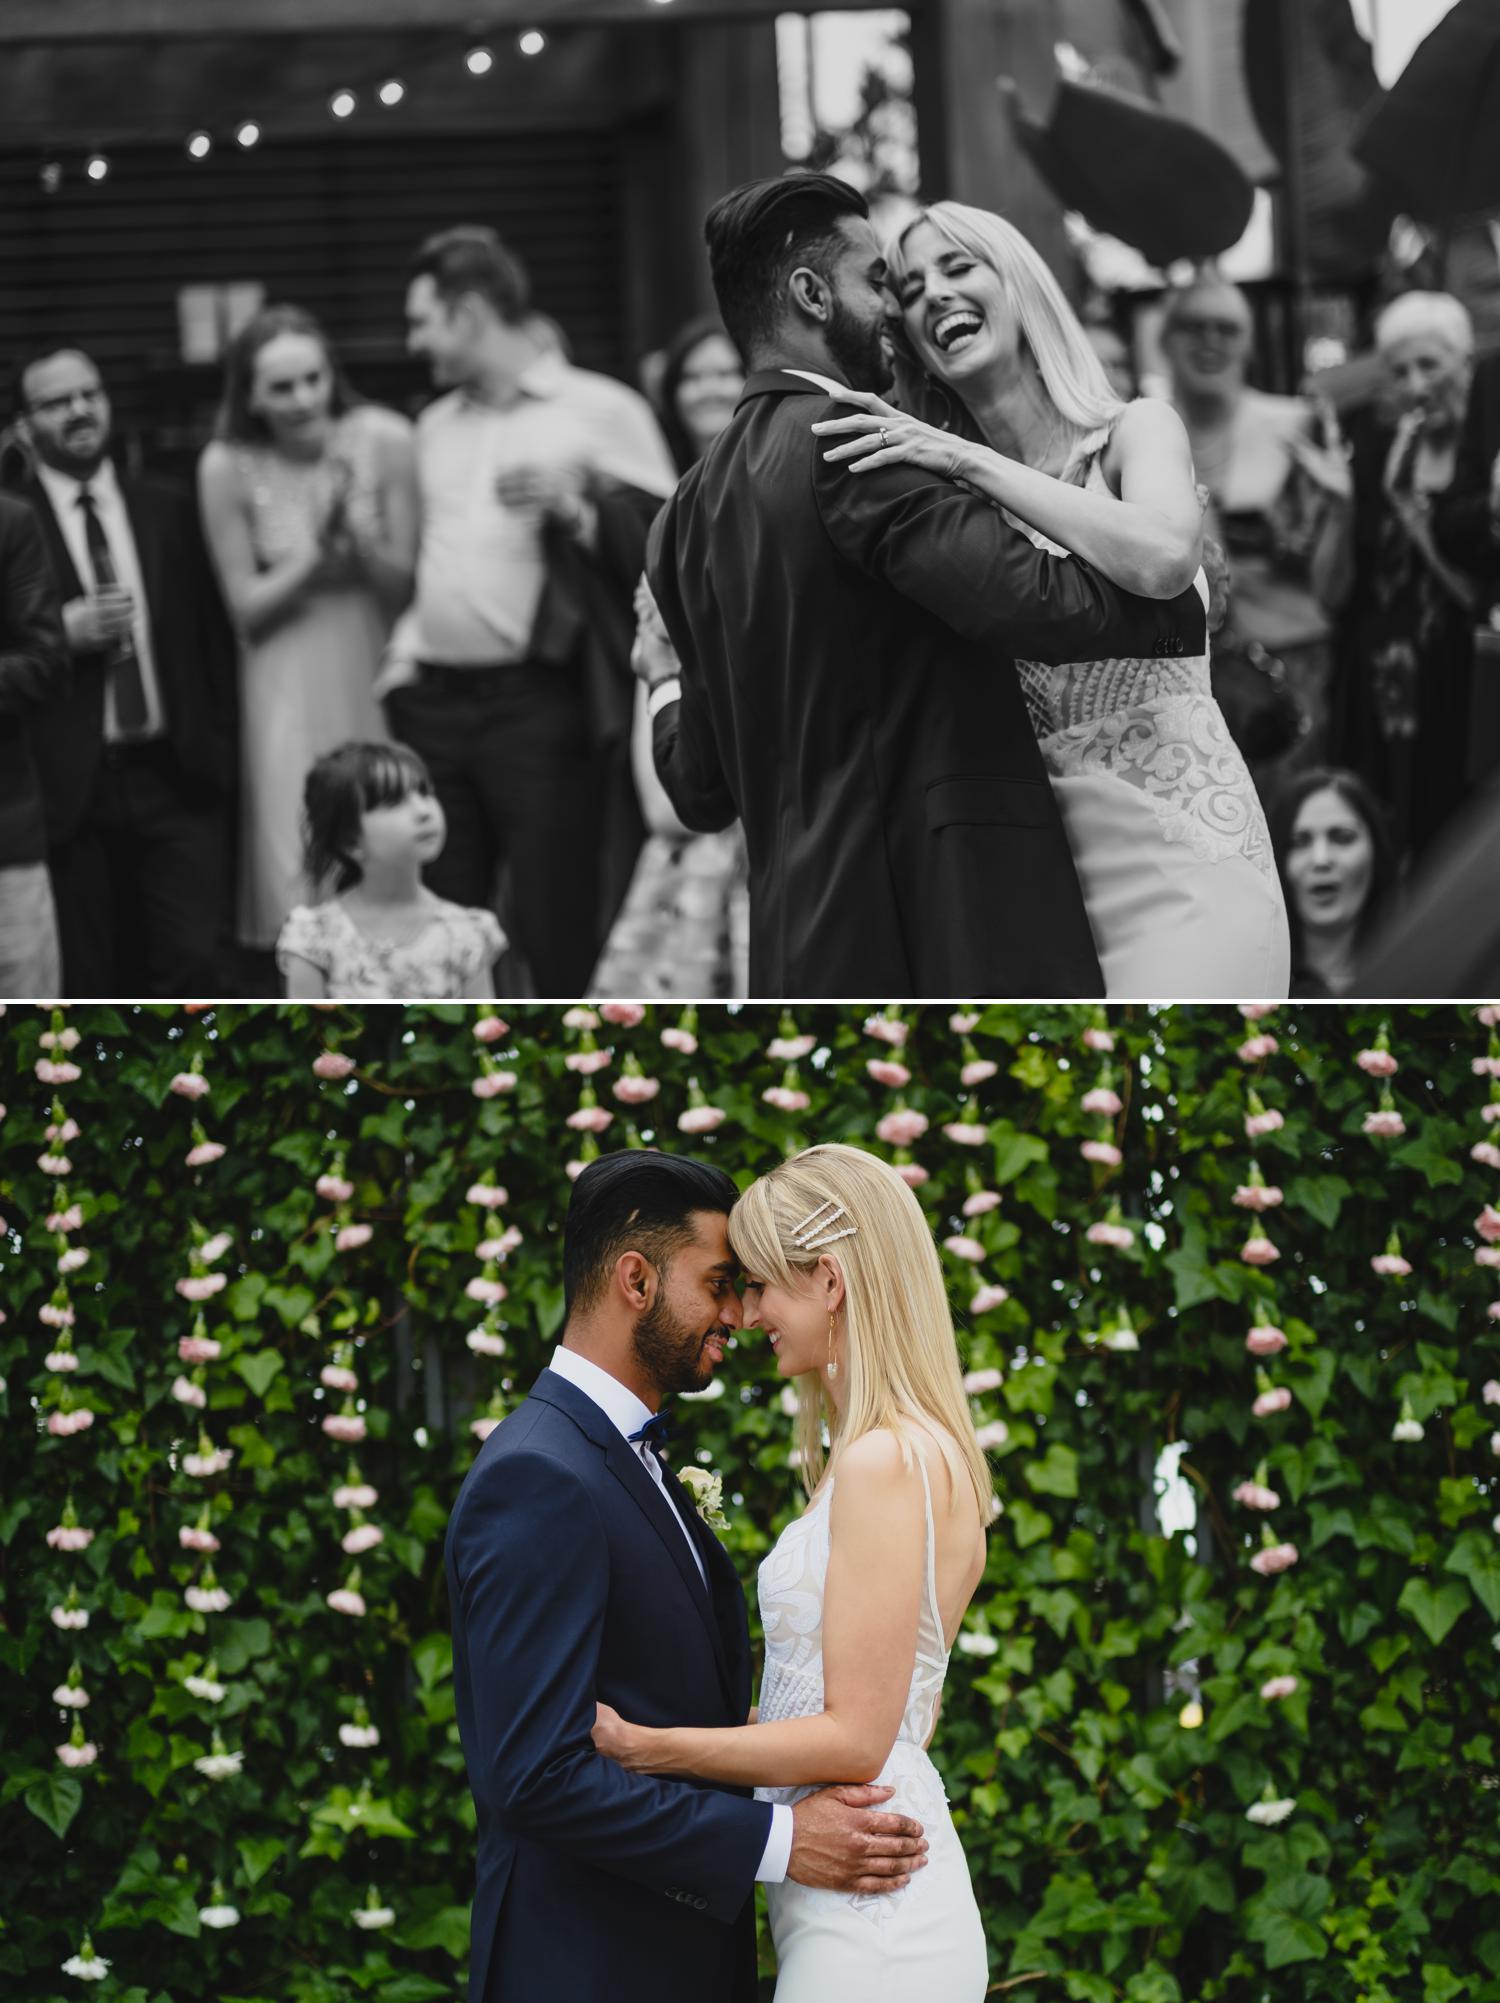 wedding photographs from aquatopia in ottawa